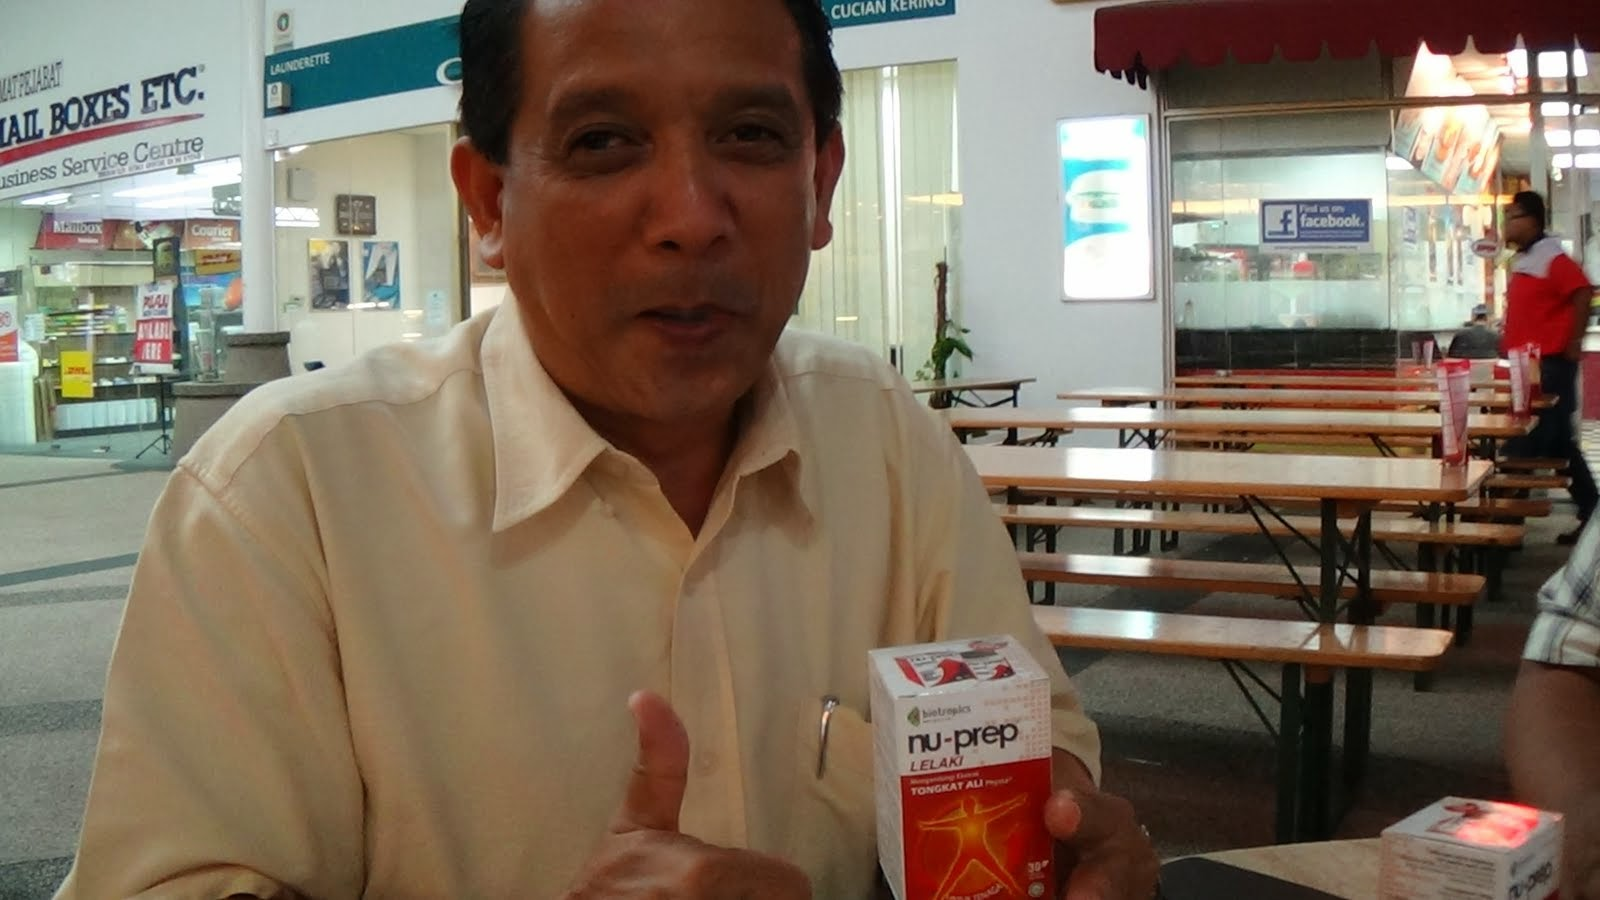 Tongkat Ali Nu-Prep lelaki 'diabetes reducer'